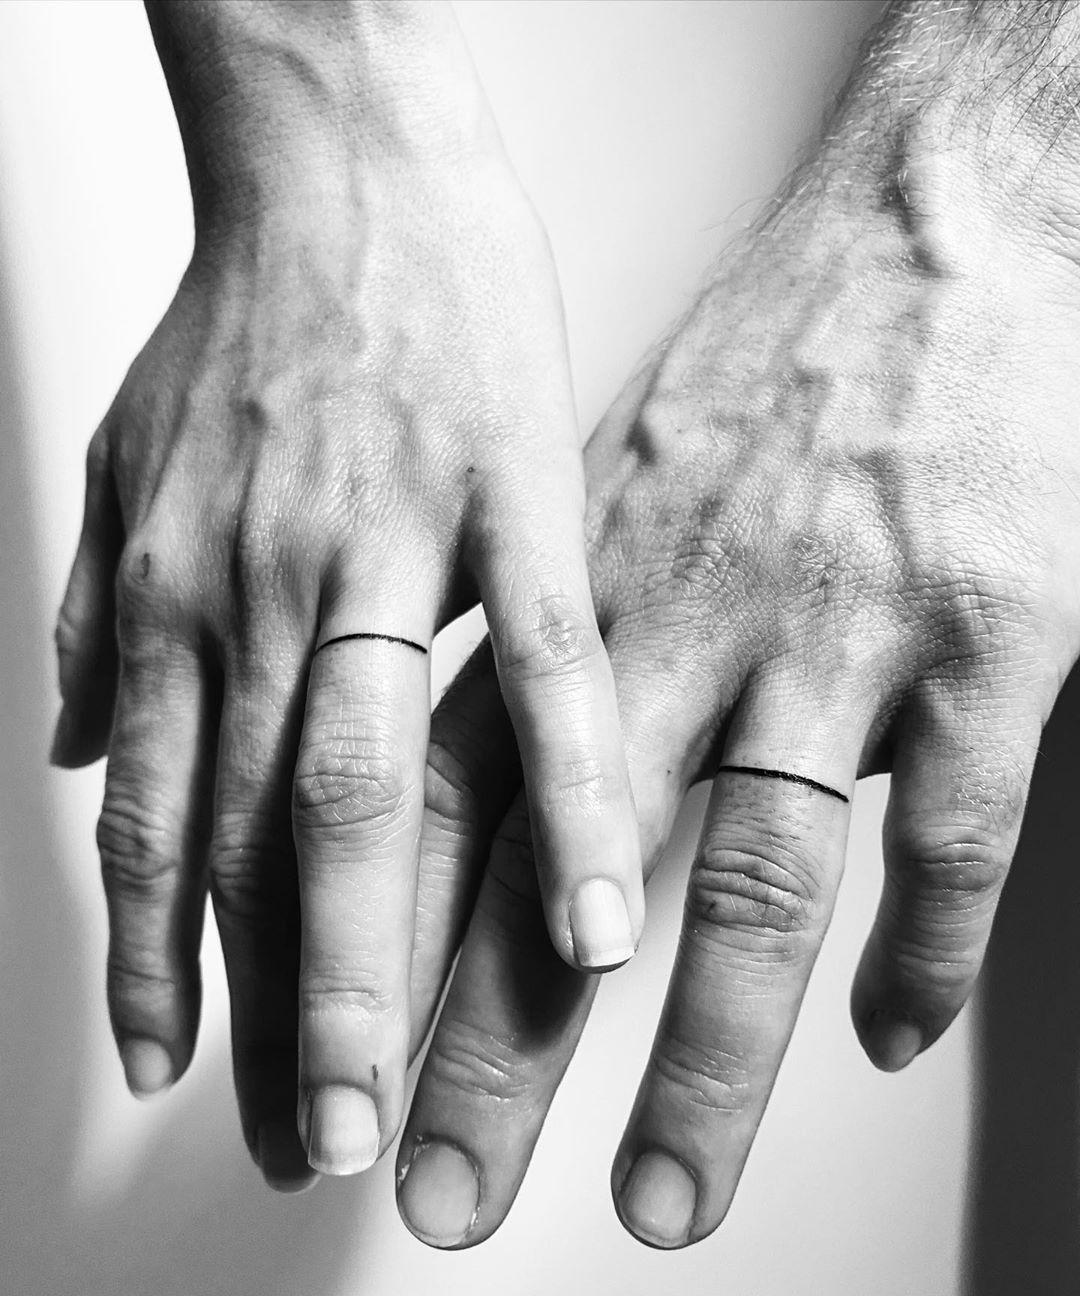 De cuando casaba a parejas preciosas... ANILLOS🖤 #tattoo #tattoos #tattooideas #tattoosleeve #tattoostyle #tattooed #tattoomodel #tattooing #tattooist #tattoodo #tattooinspiration #tattoolove #tattooartist #tattooartwork #tattoooftheday #tattoolife #tattooink #ink #inked #inkedmen #inkedgirls #ring #rings #ringtattoo #justmarried in love con esta pareja🖤